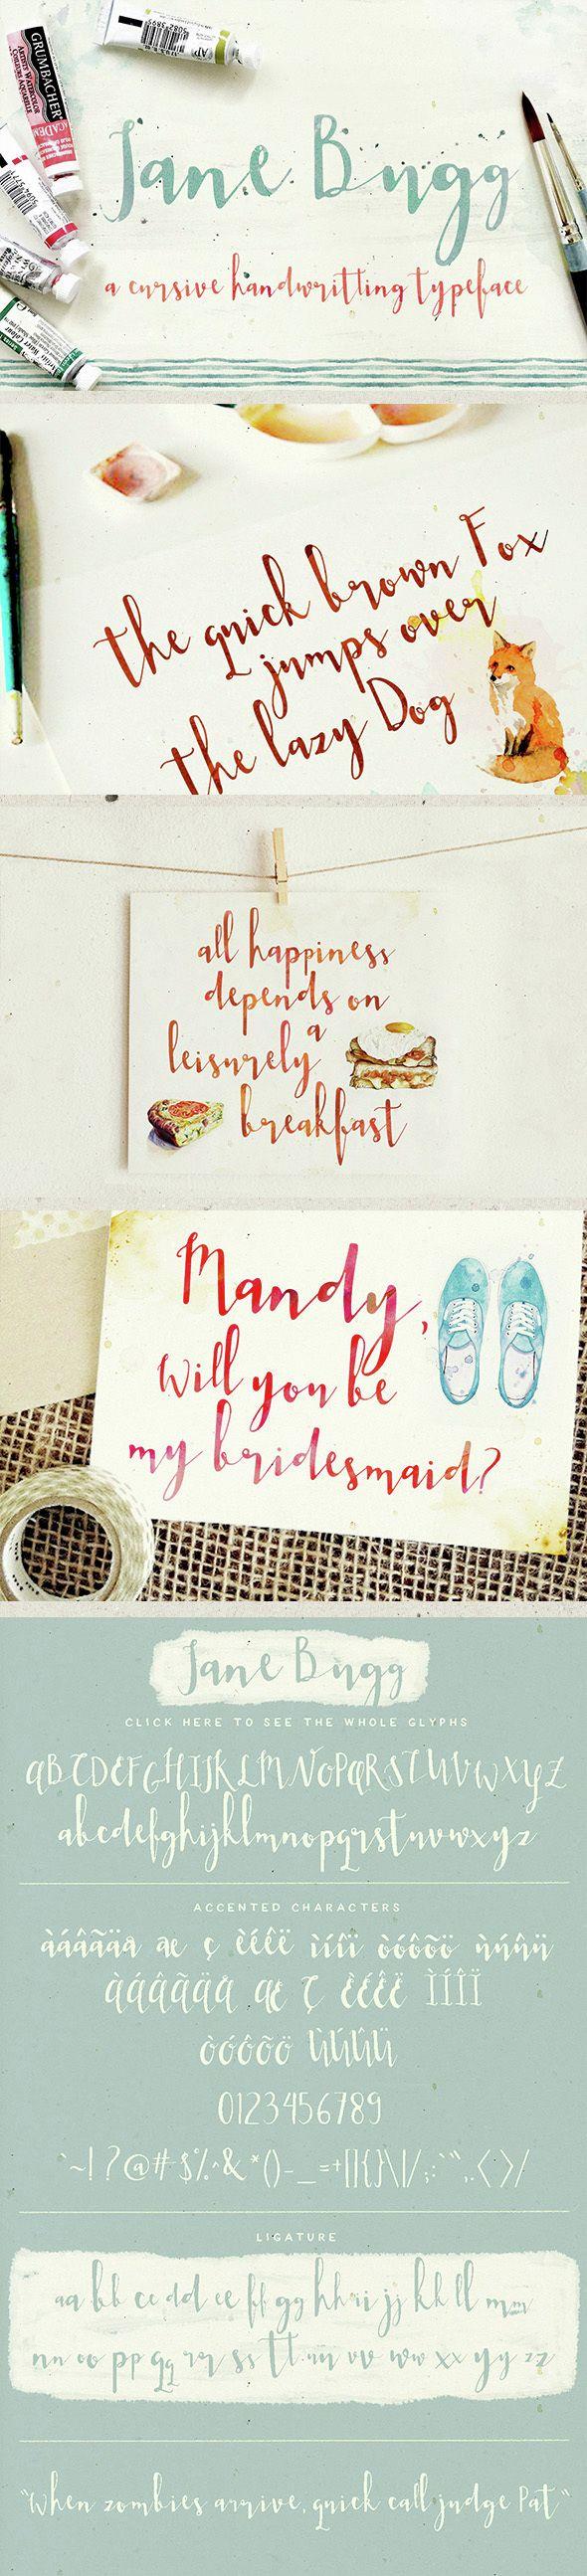 cursive fonts for wedding cards%0A Best     Cursive script ideas on Pinterest   Beautiful cursive fonts   Cursive and Cursive calligraphy